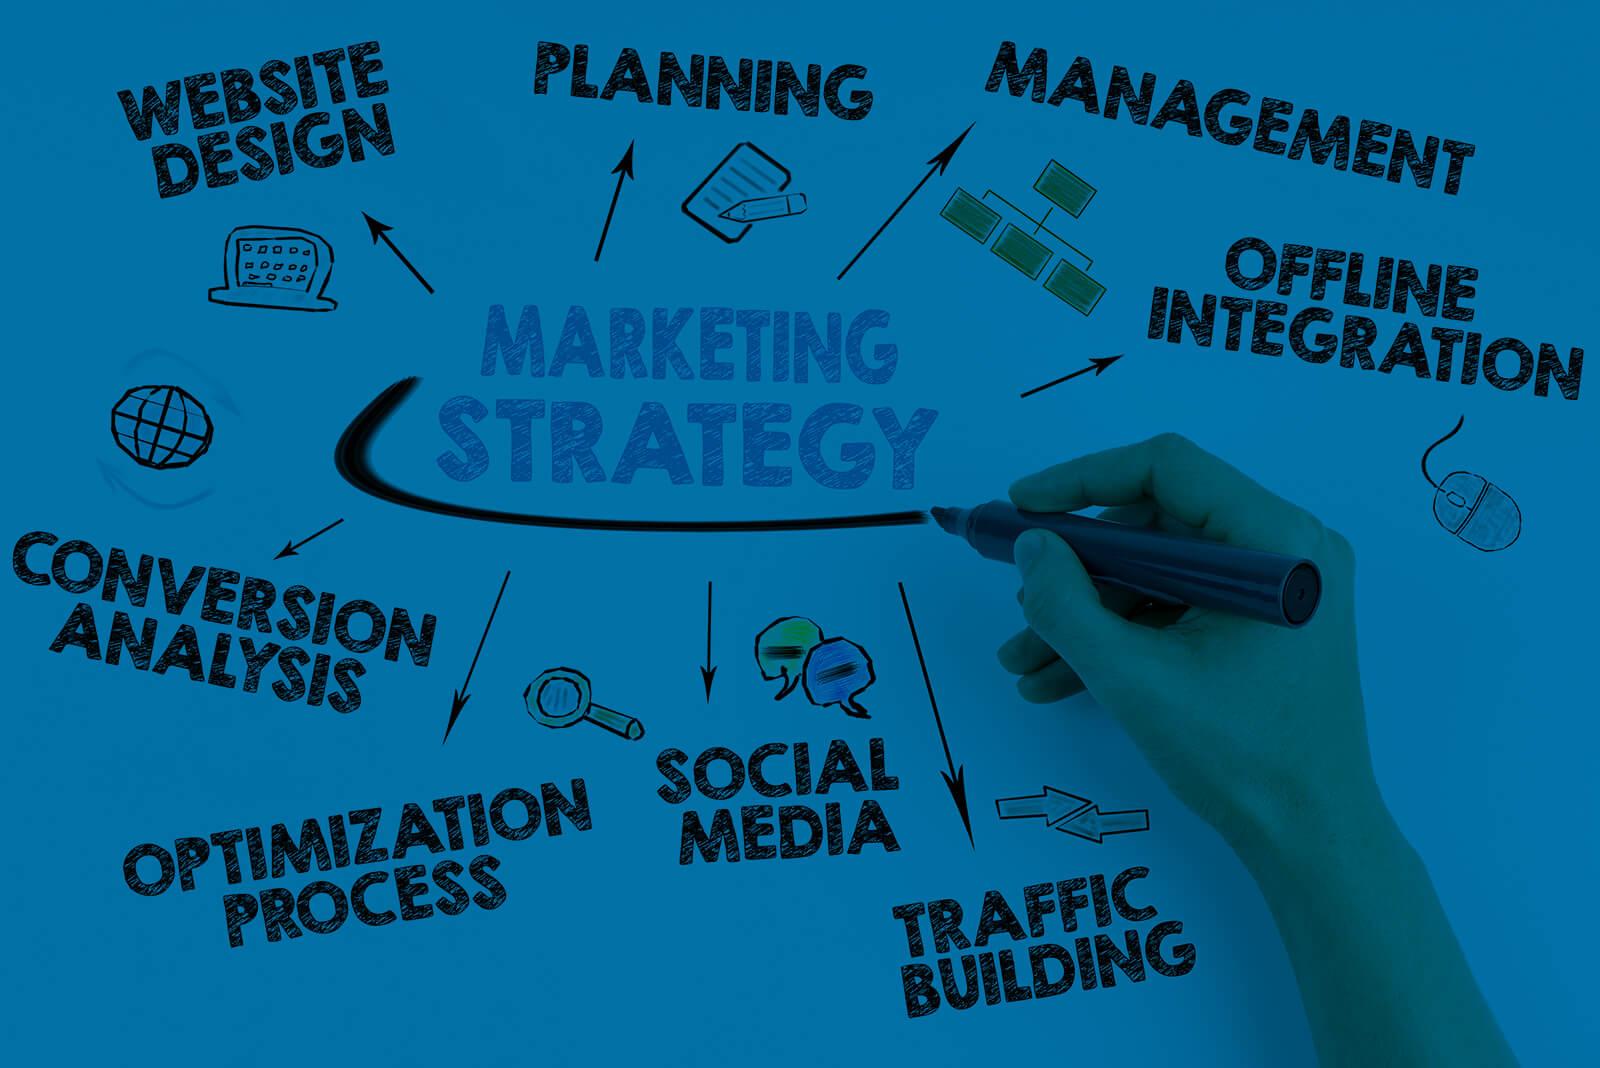 Build an effective social marketing strategy